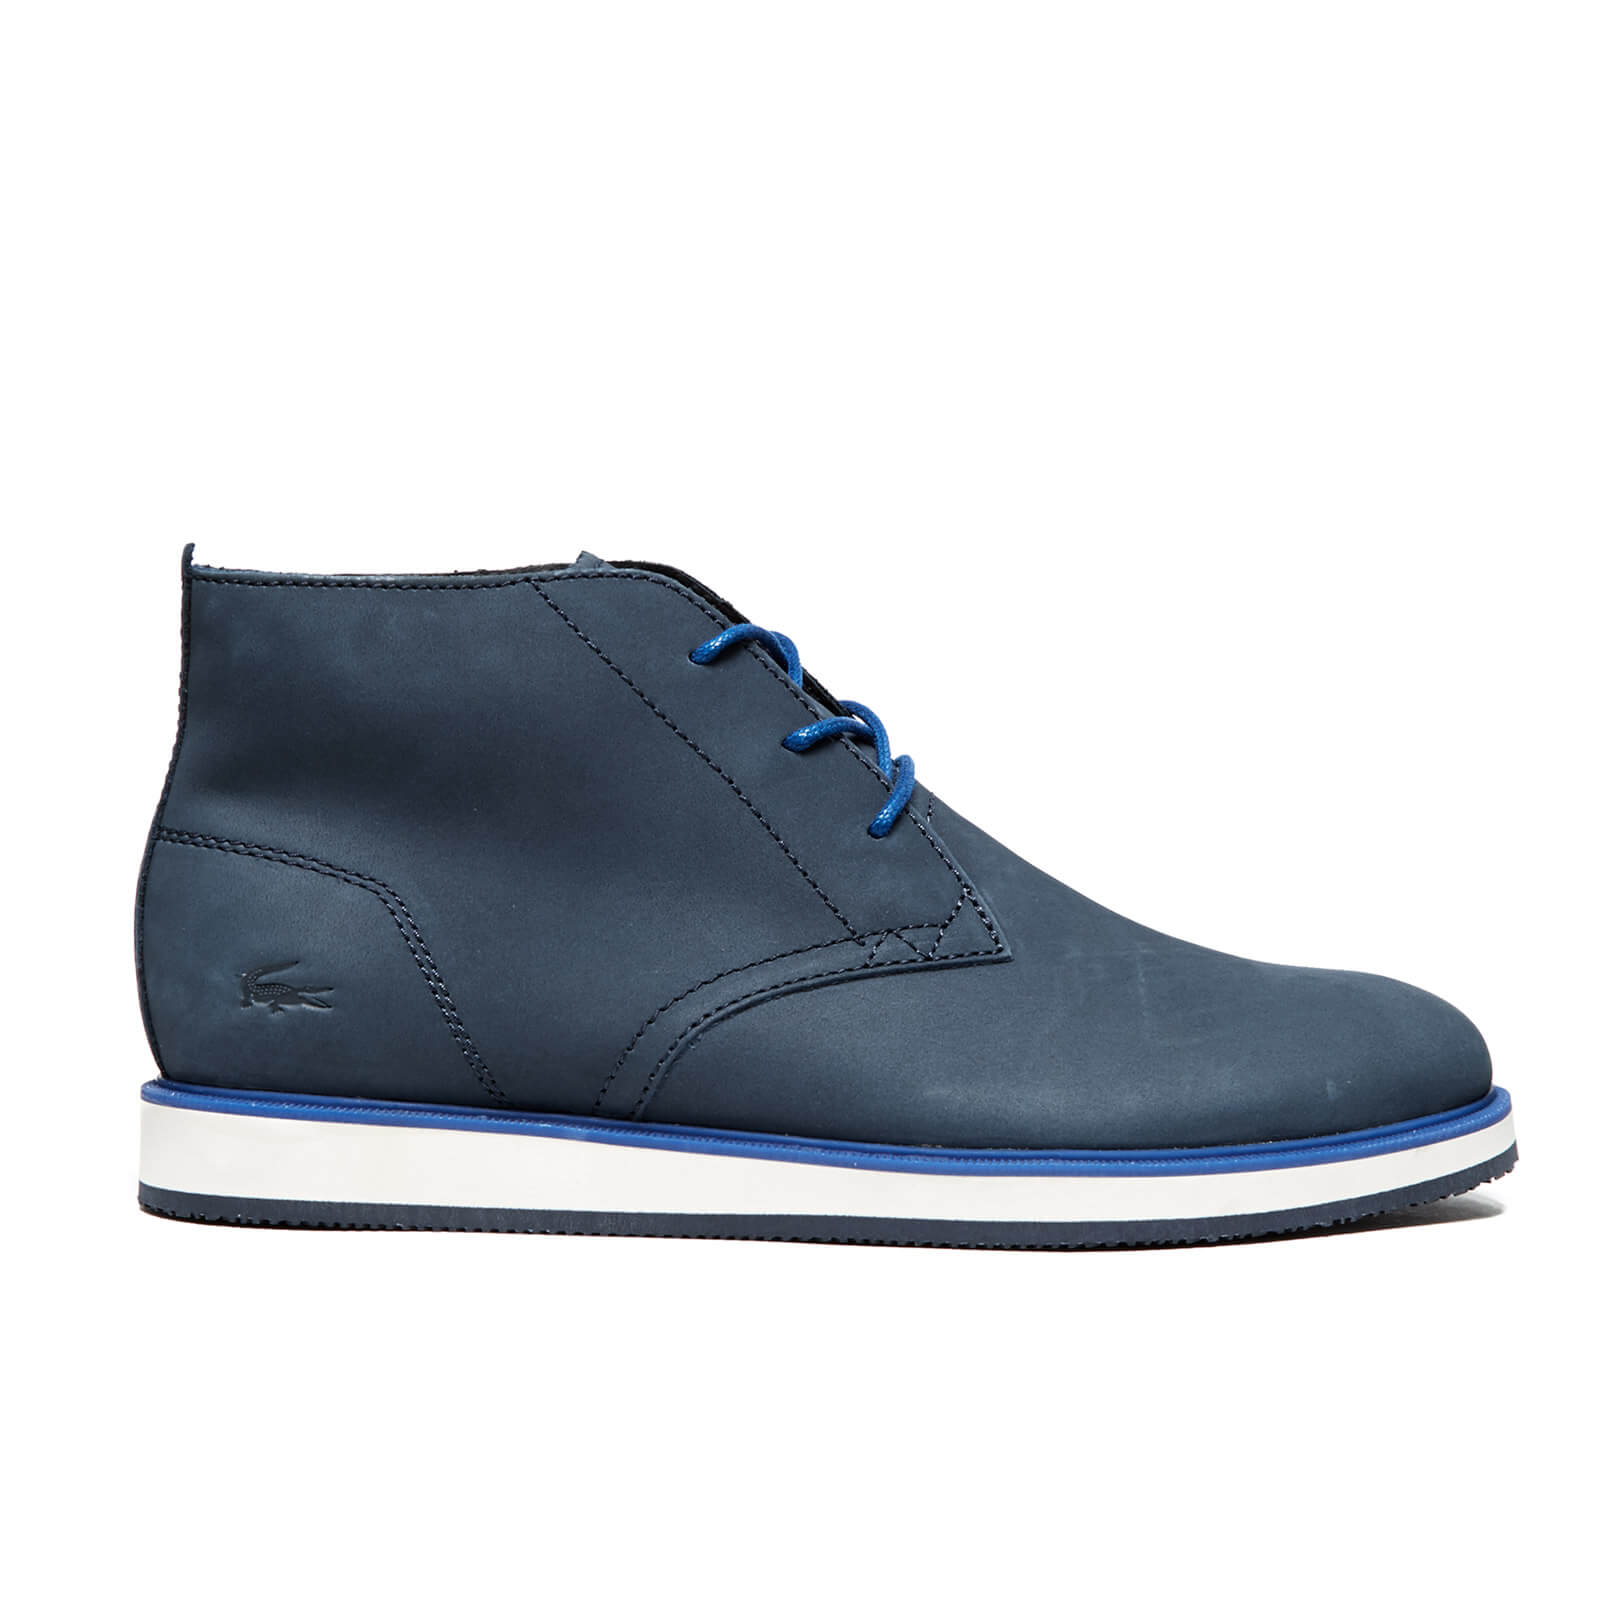 8428e350a69 Lacoste Men's Millard 116 1 Cam Chukka Boots - Navy